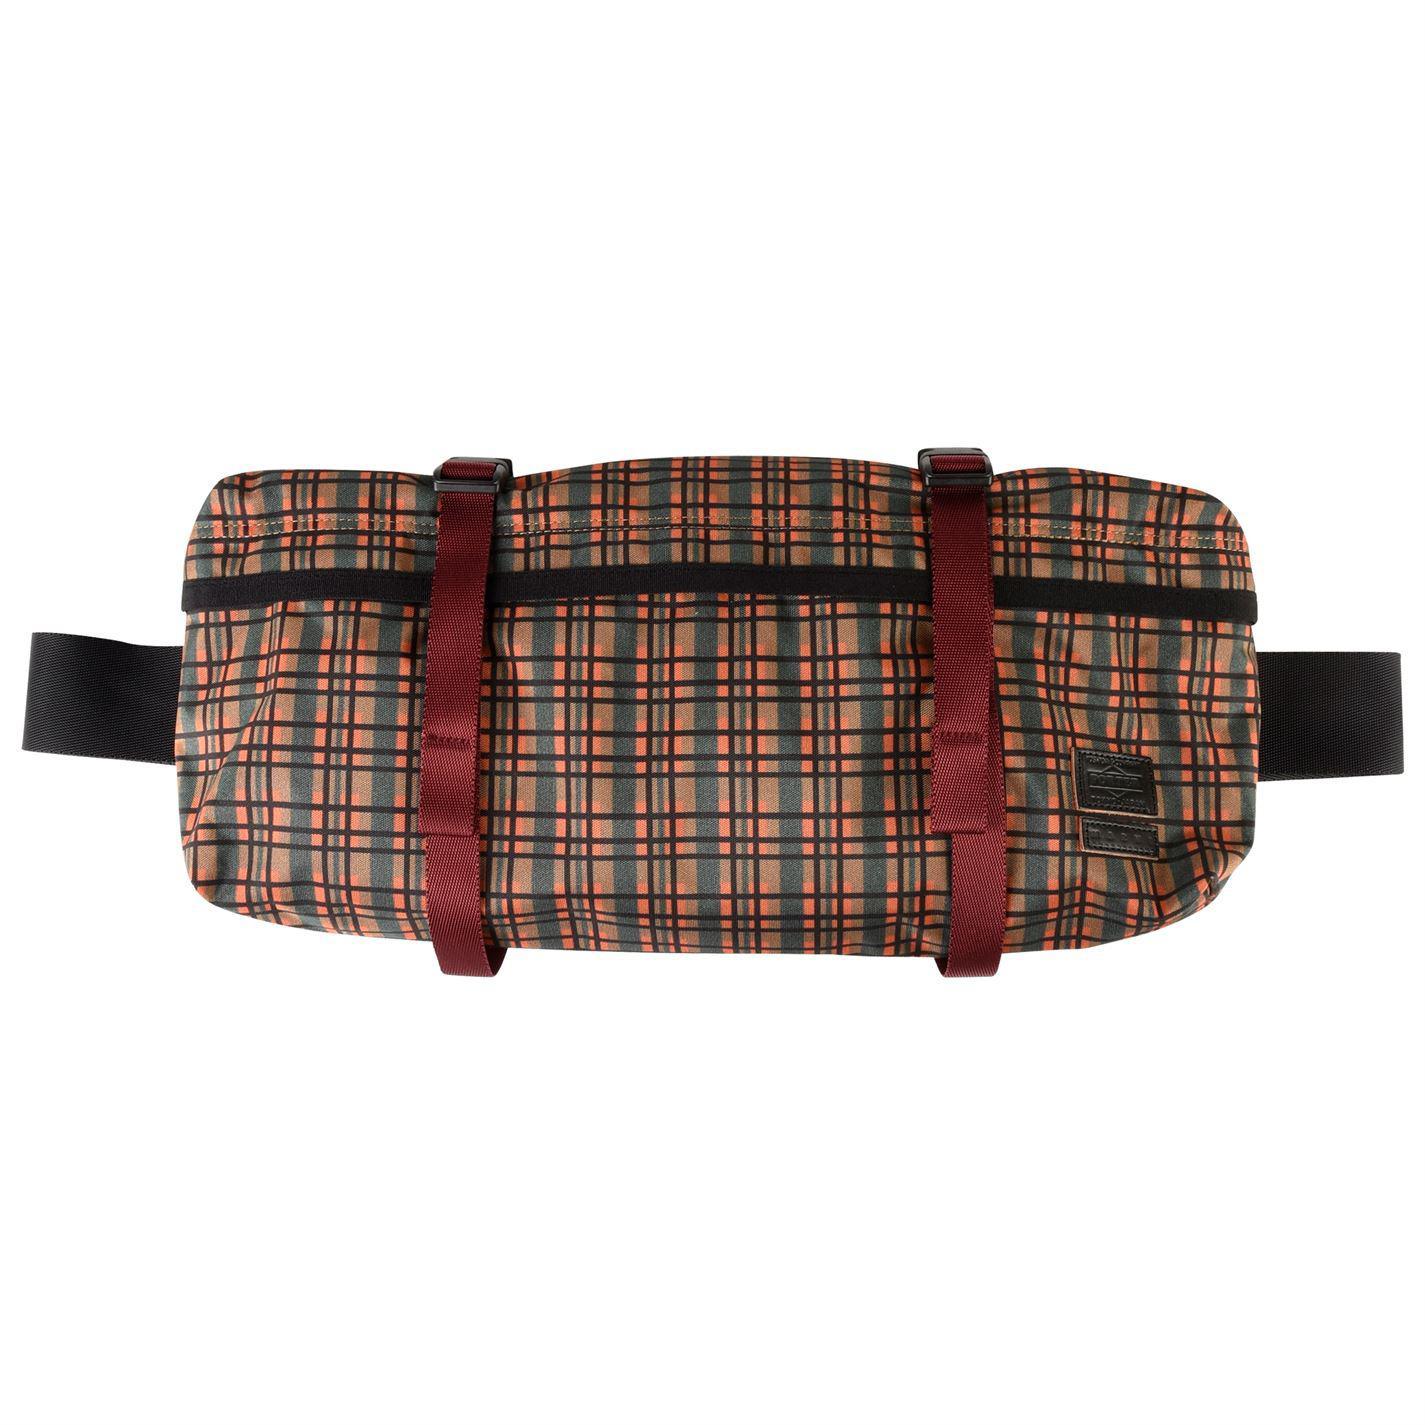 483149fe96d9 Lyst - Marni X Porter Belt Bag in Red for Men